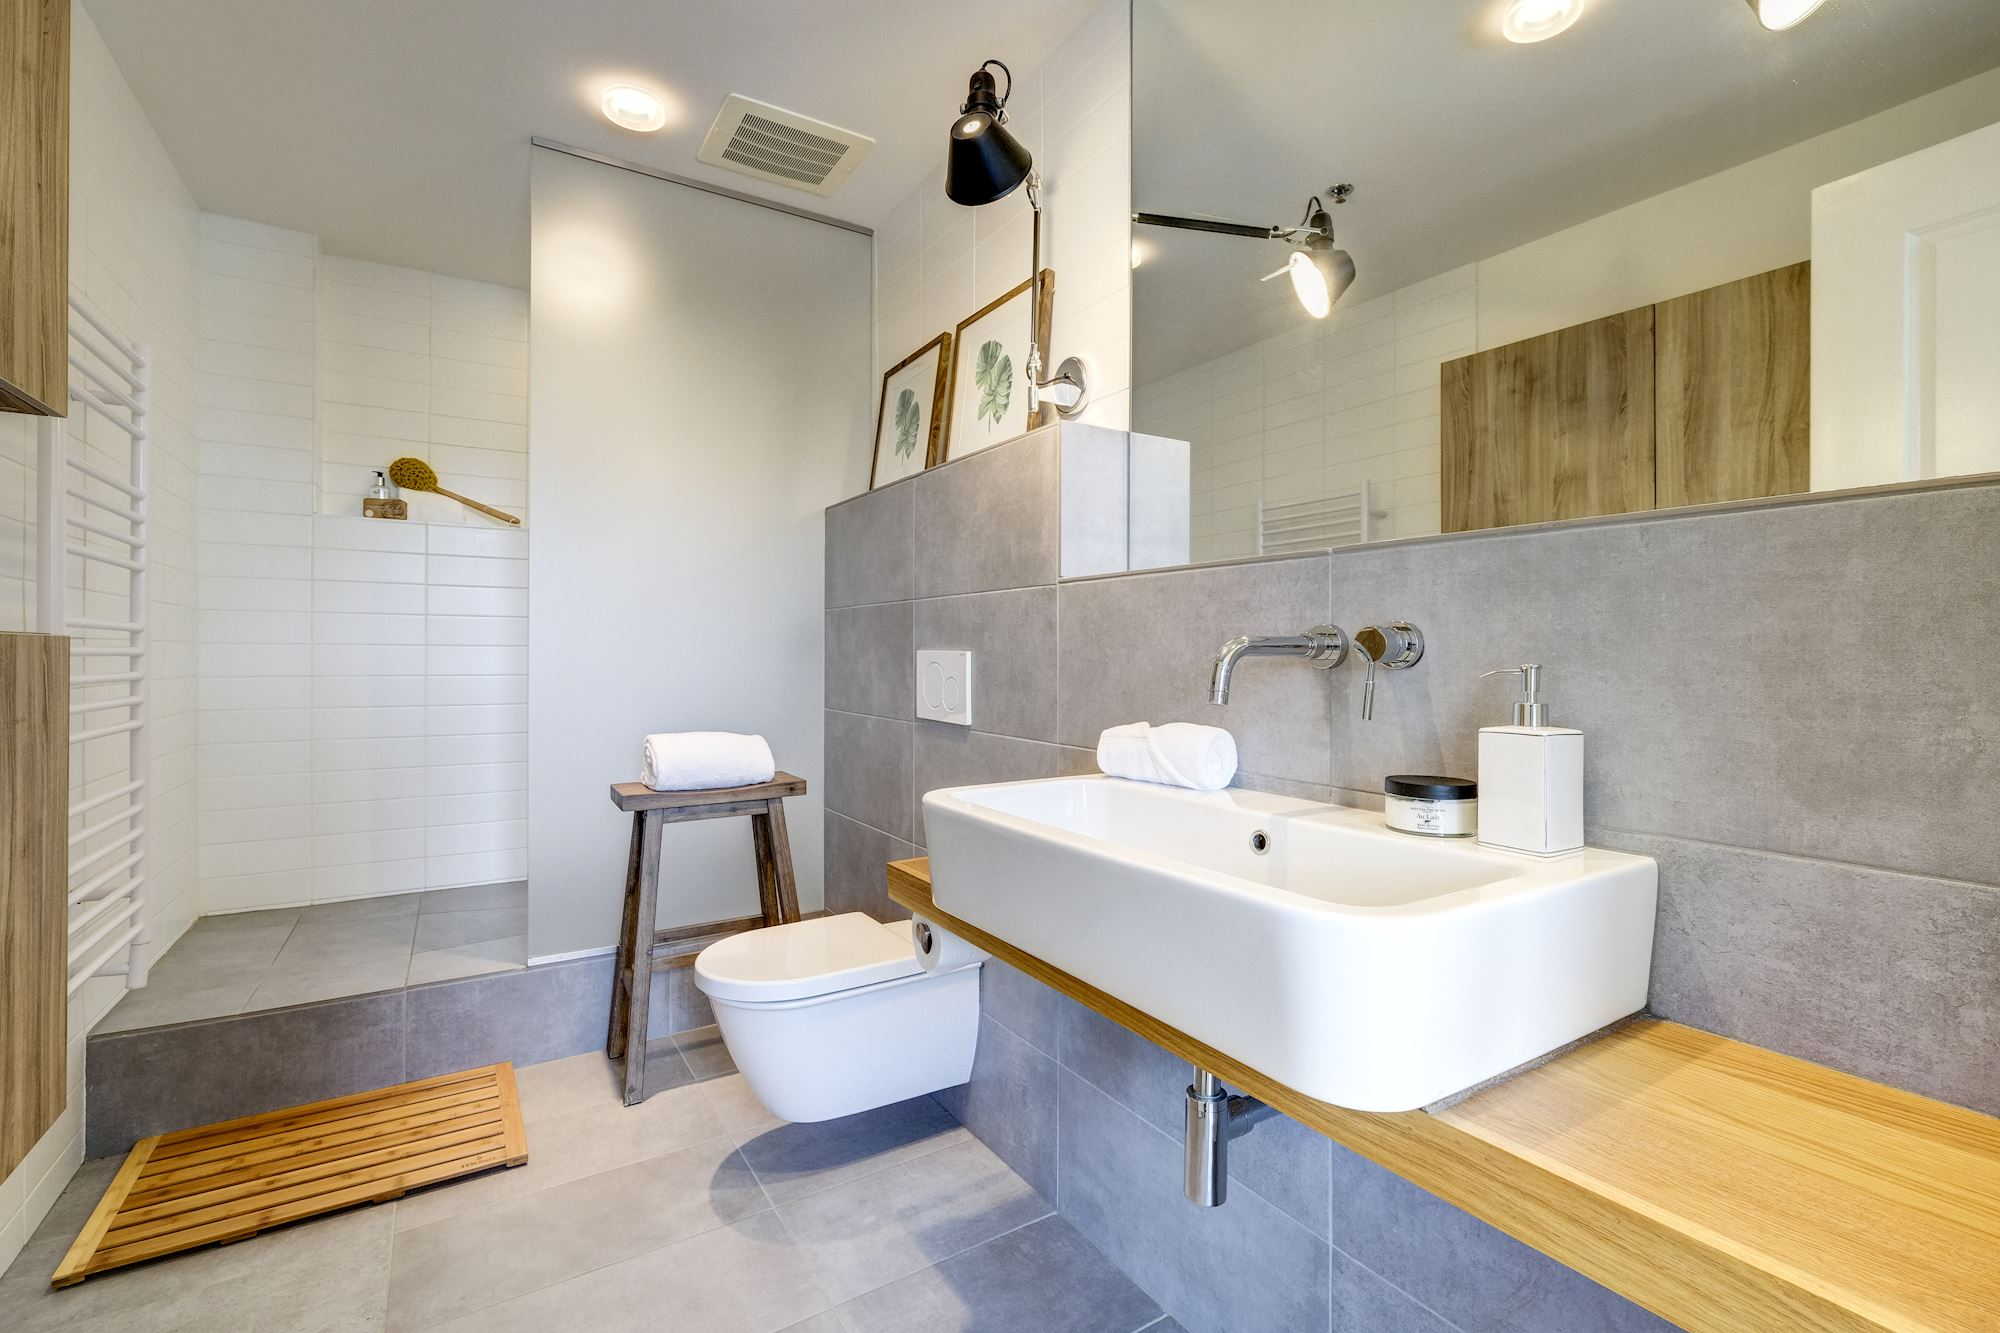 2125 14th Street NW,Washington,District Of Columbia 20009,3 Bedrooms Bedrooms,3 Bathrooms Bathrooms,Condominium,Warehouses at Union Row,14th Street,1041